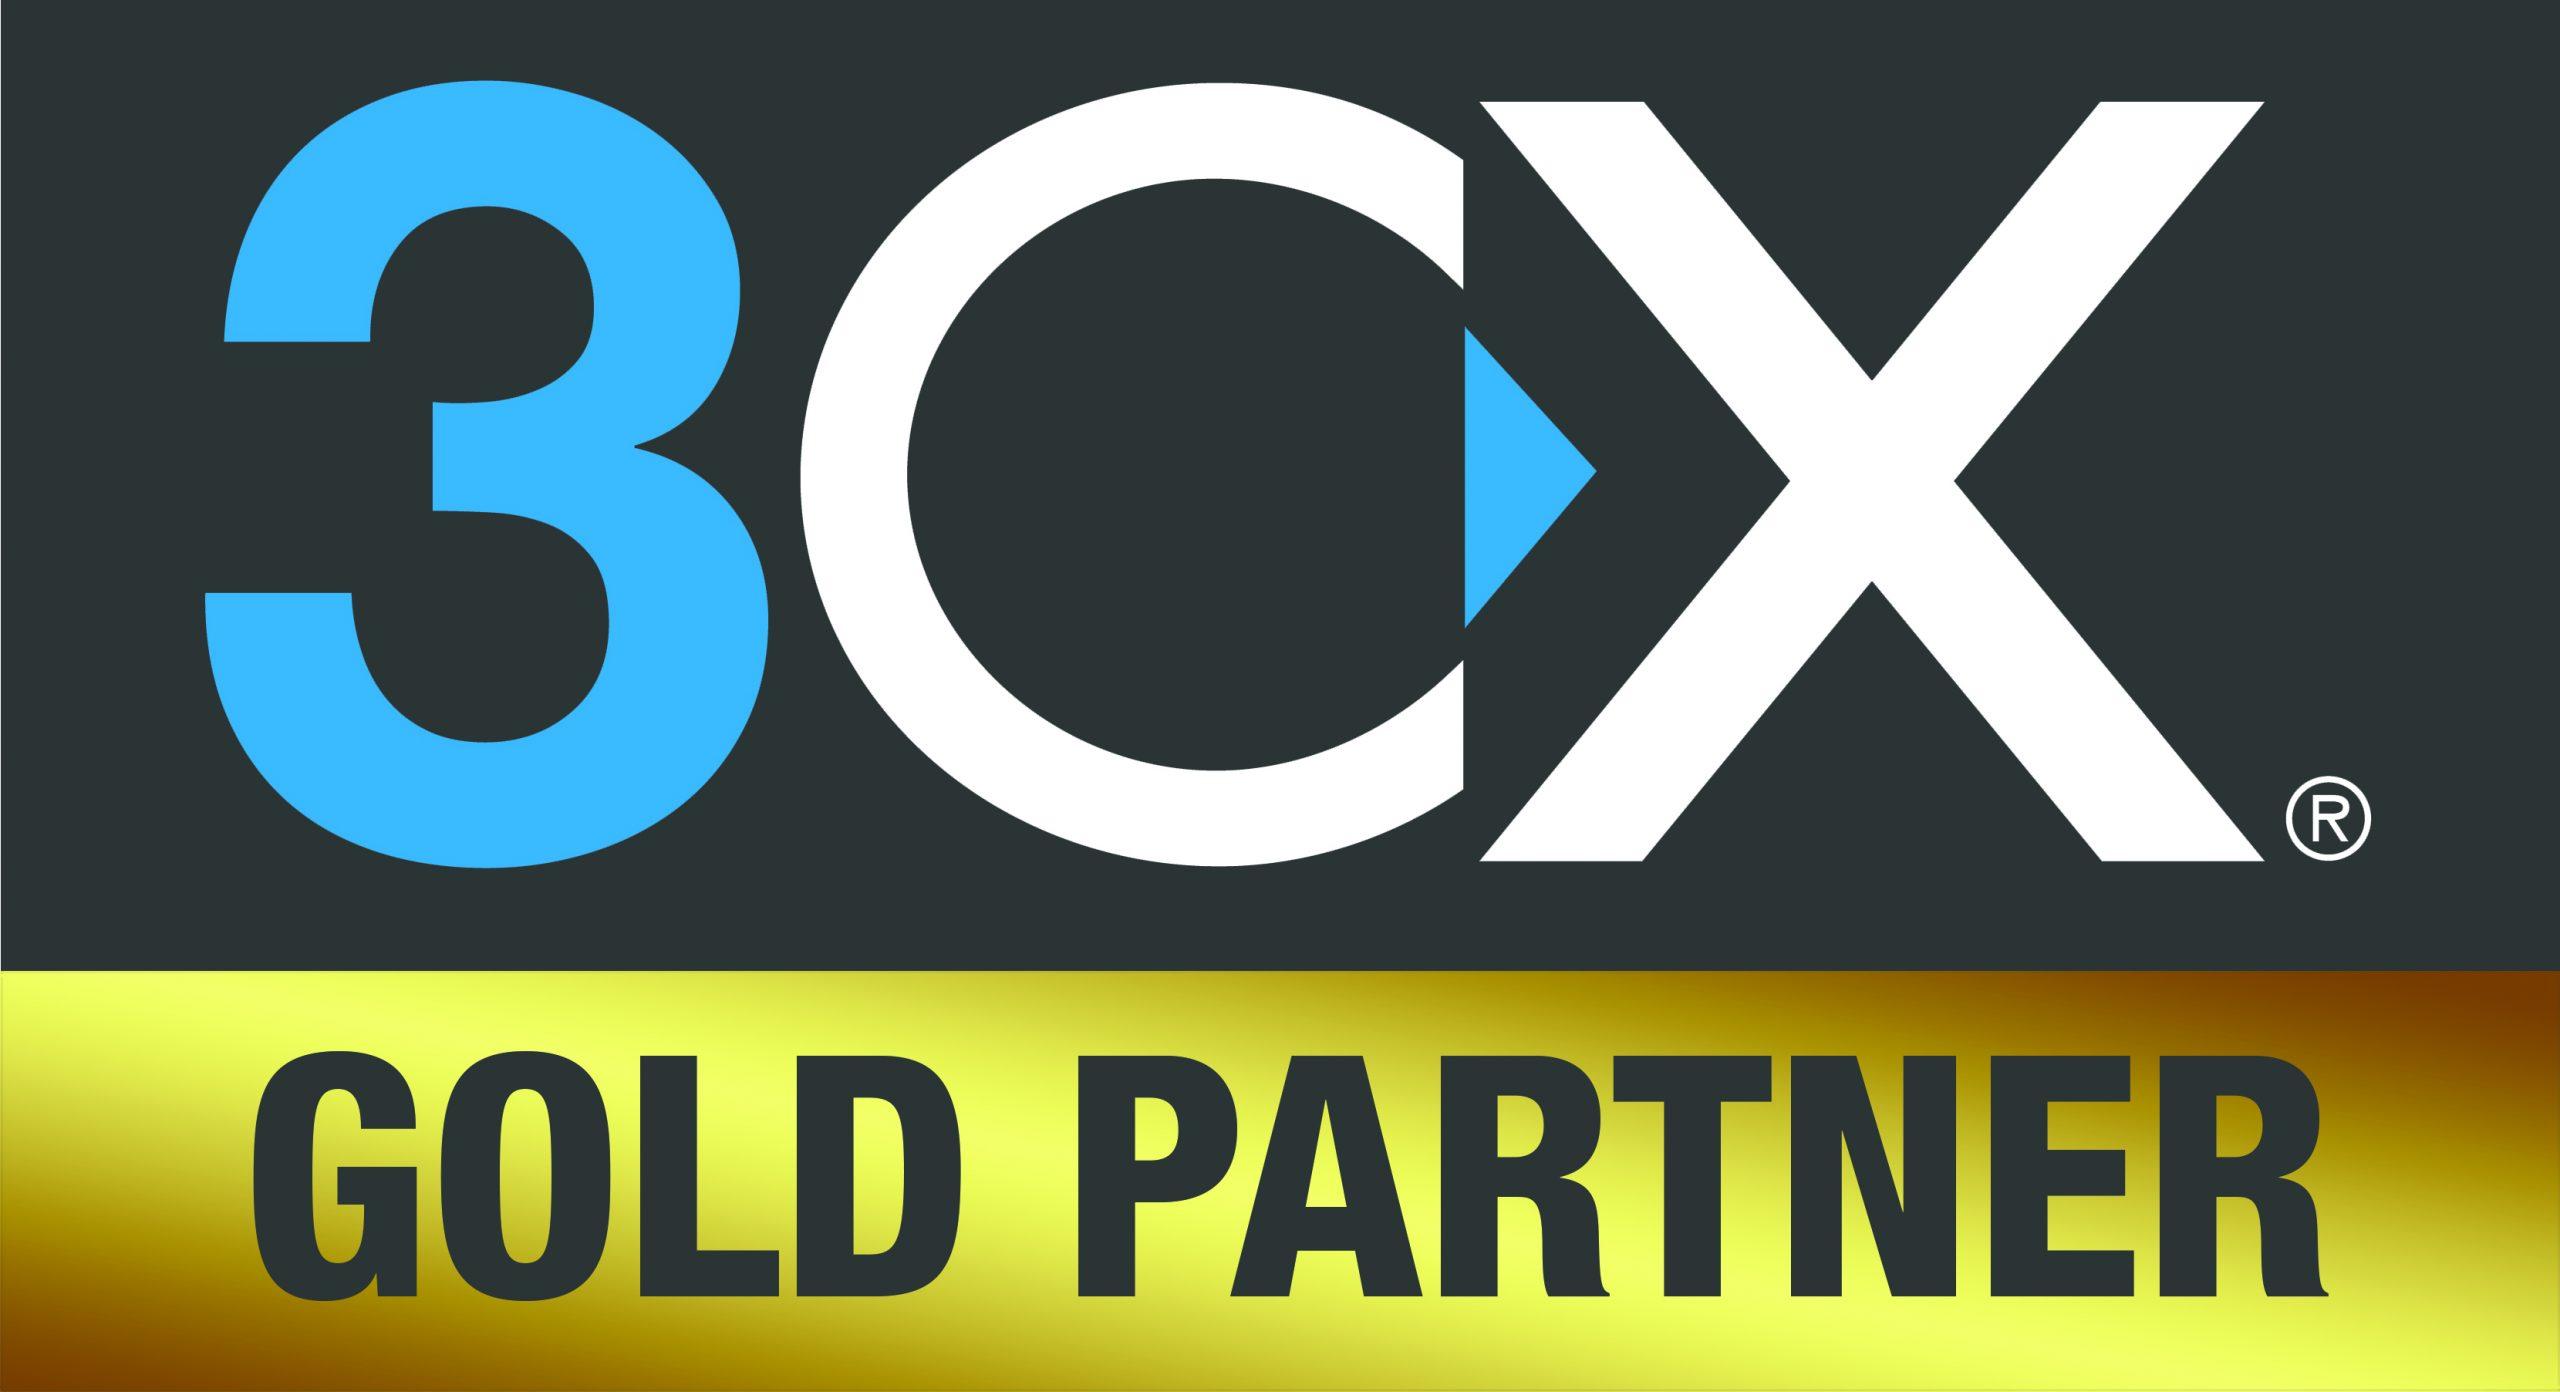 3CX Phone System Platinum Partner